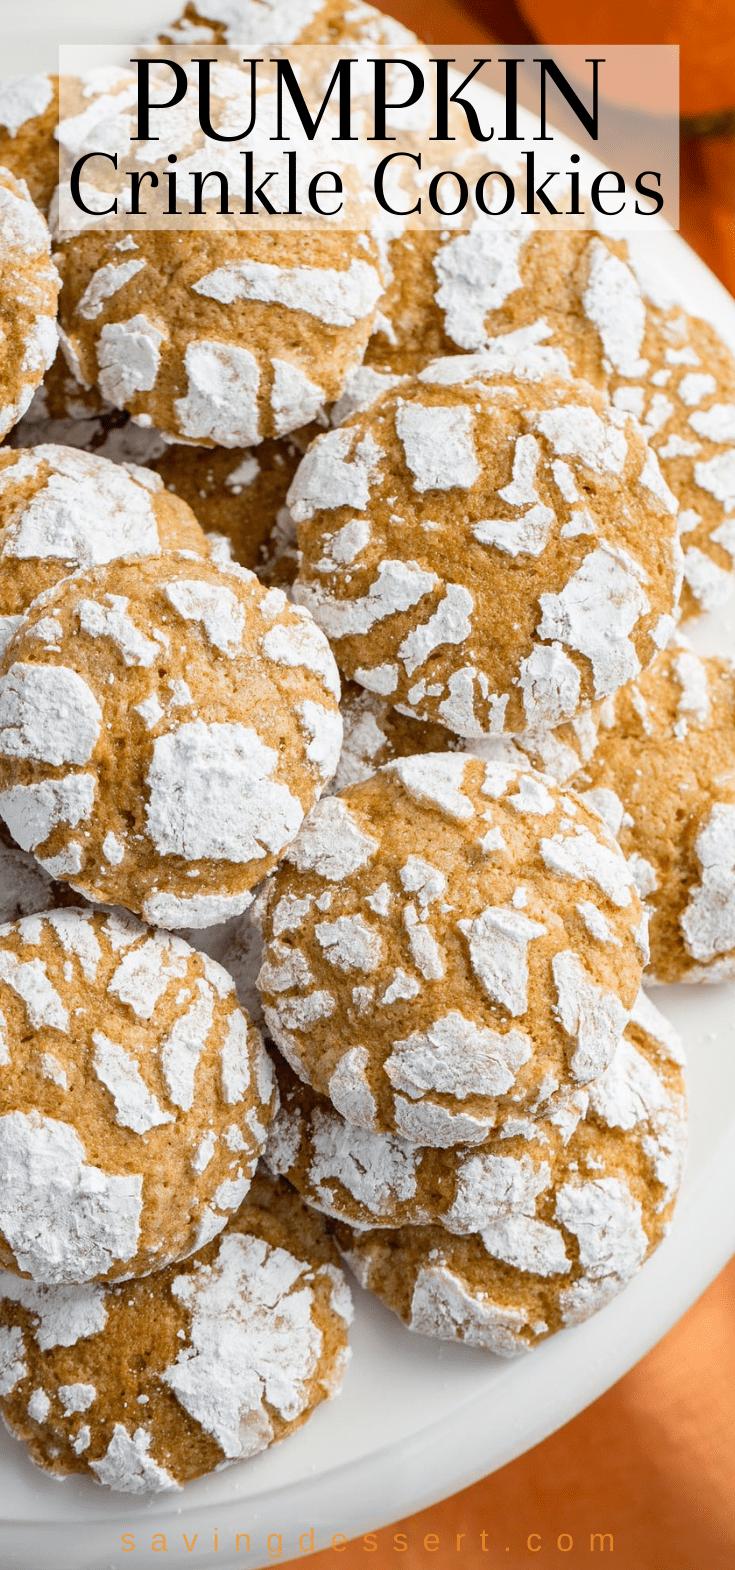 An overhead view of a platter of Pumpkin Crinkle Cookies